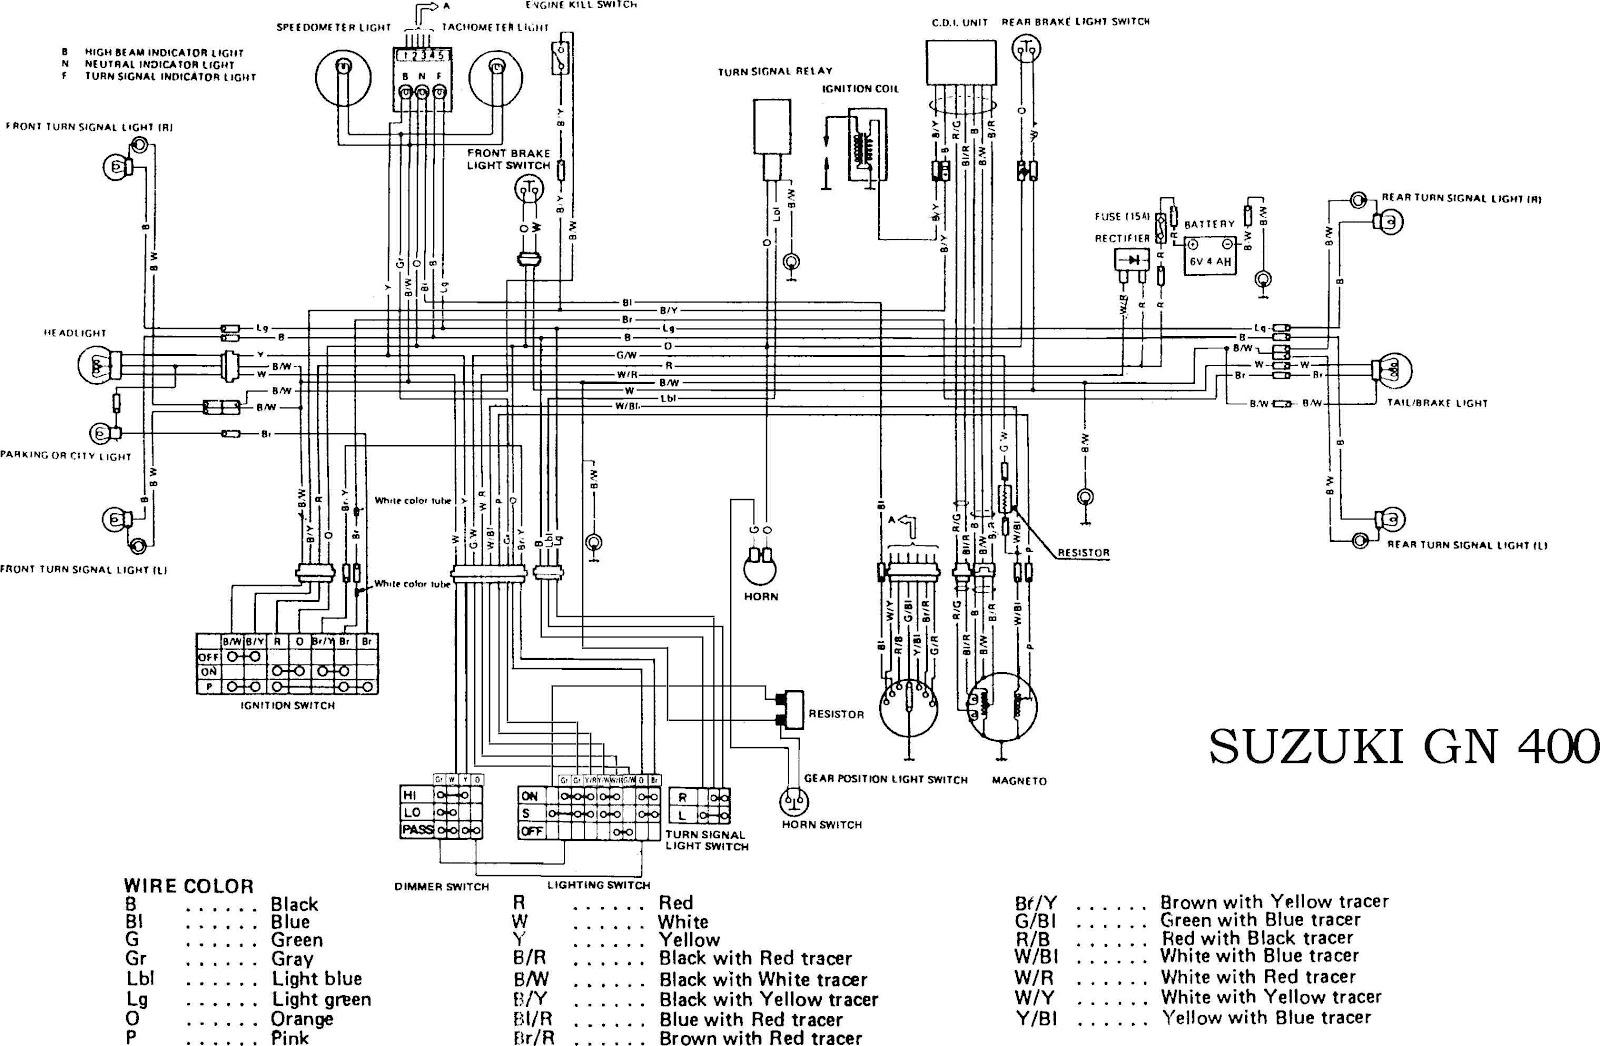 amusing suzuki intruder 800 wiring diagram photos best image on Rostra Cruise Control Wiring Diagram for charming suzuki c50 wiring diagram ideas electrical and wiring at Kawasaki Vn1500 Wiring Diagram